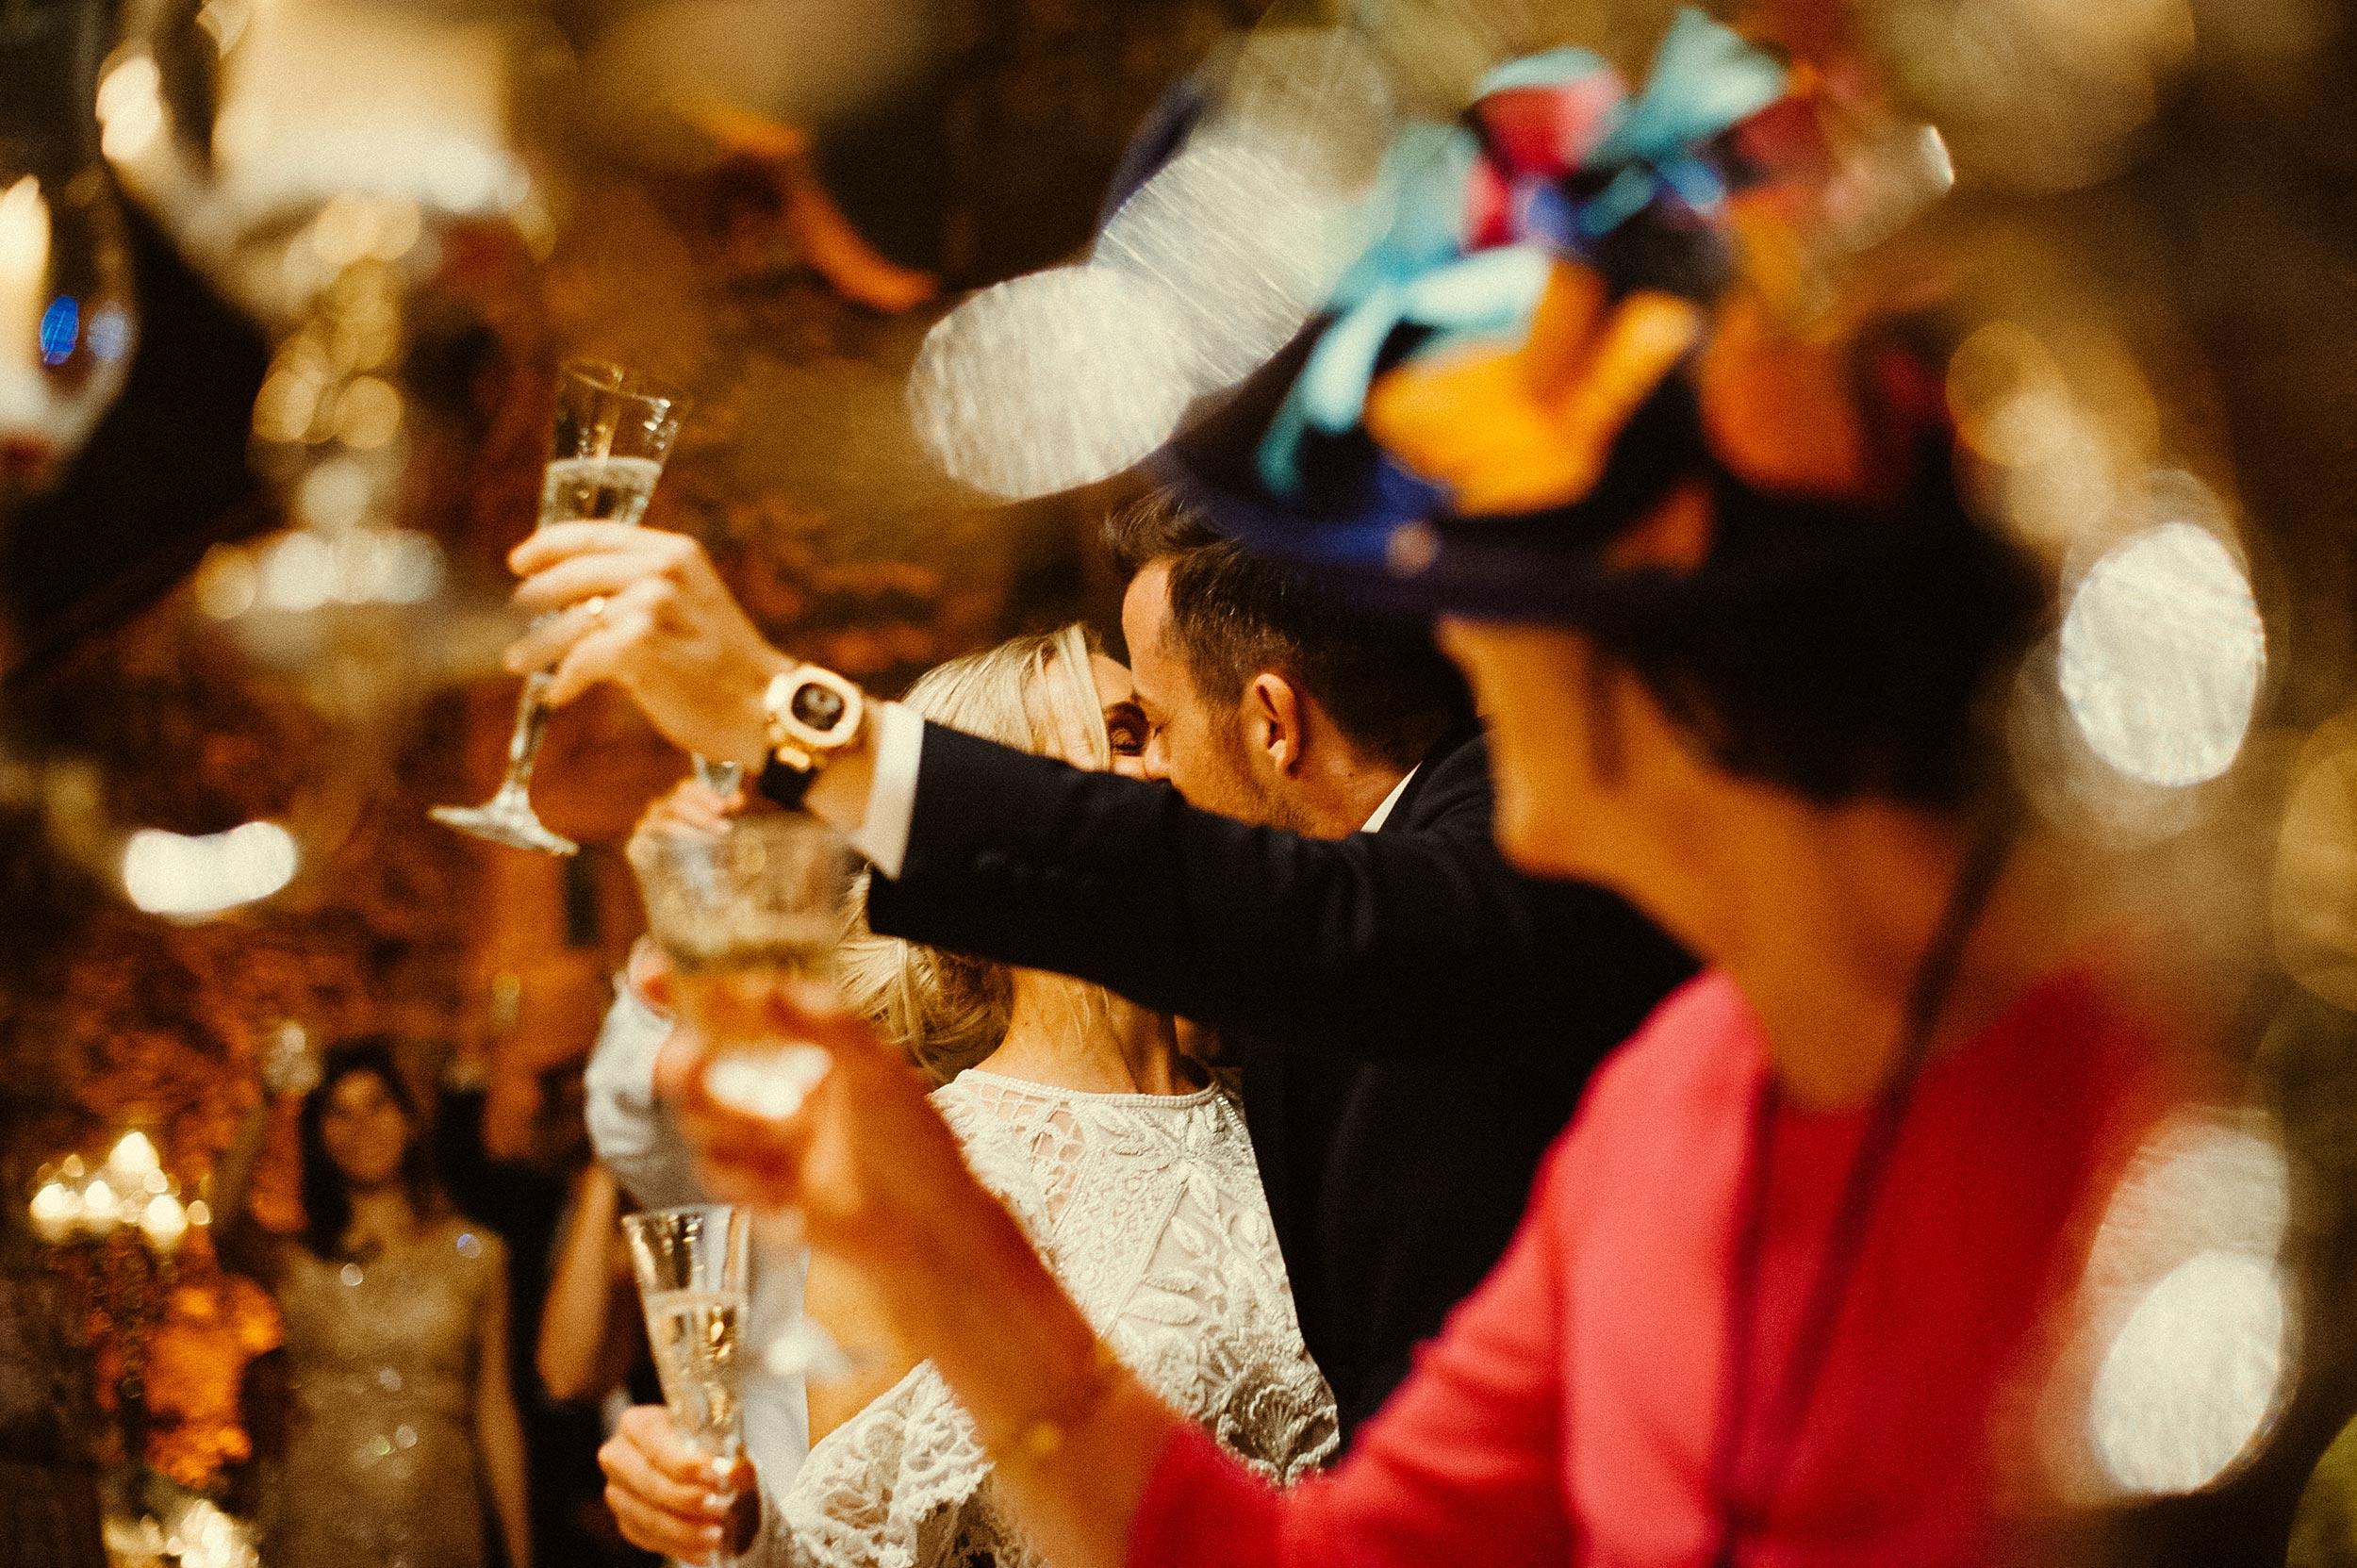 bride-and-groom kissing-in-castello -di-vincigliata-tuscany-luxury-wedding-by-Alessandro-Avenali.jpg